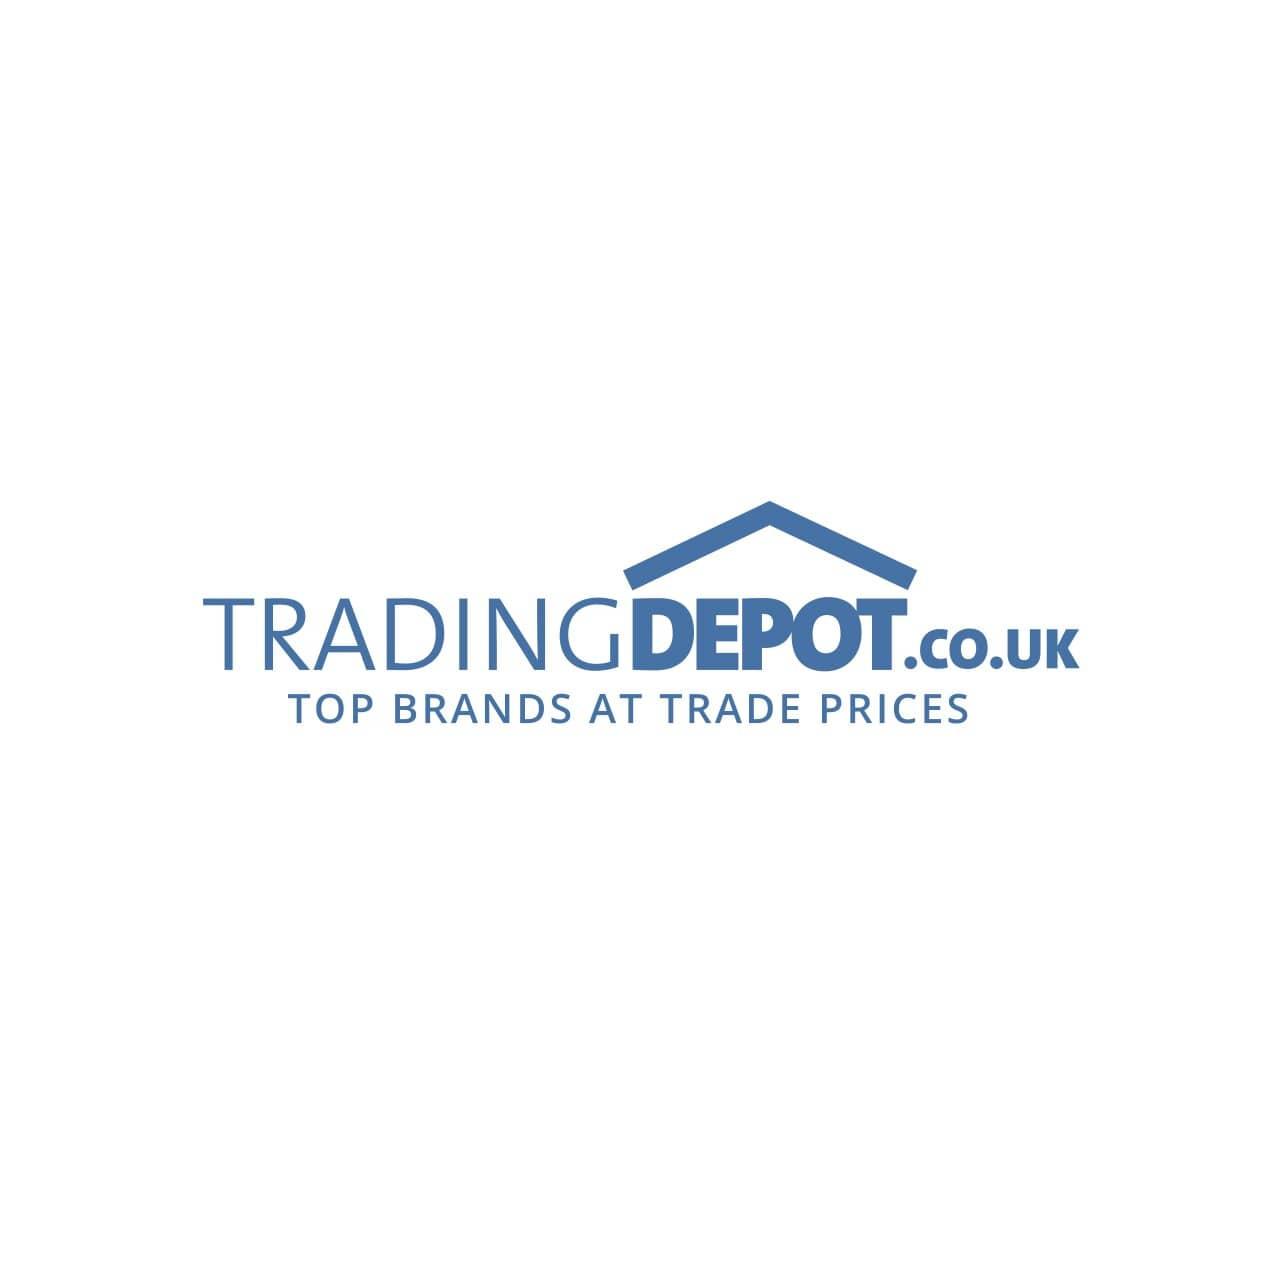 Britool Expert 1/4in Bit Set 49 Piece + Bit Holder - BRIE131701B